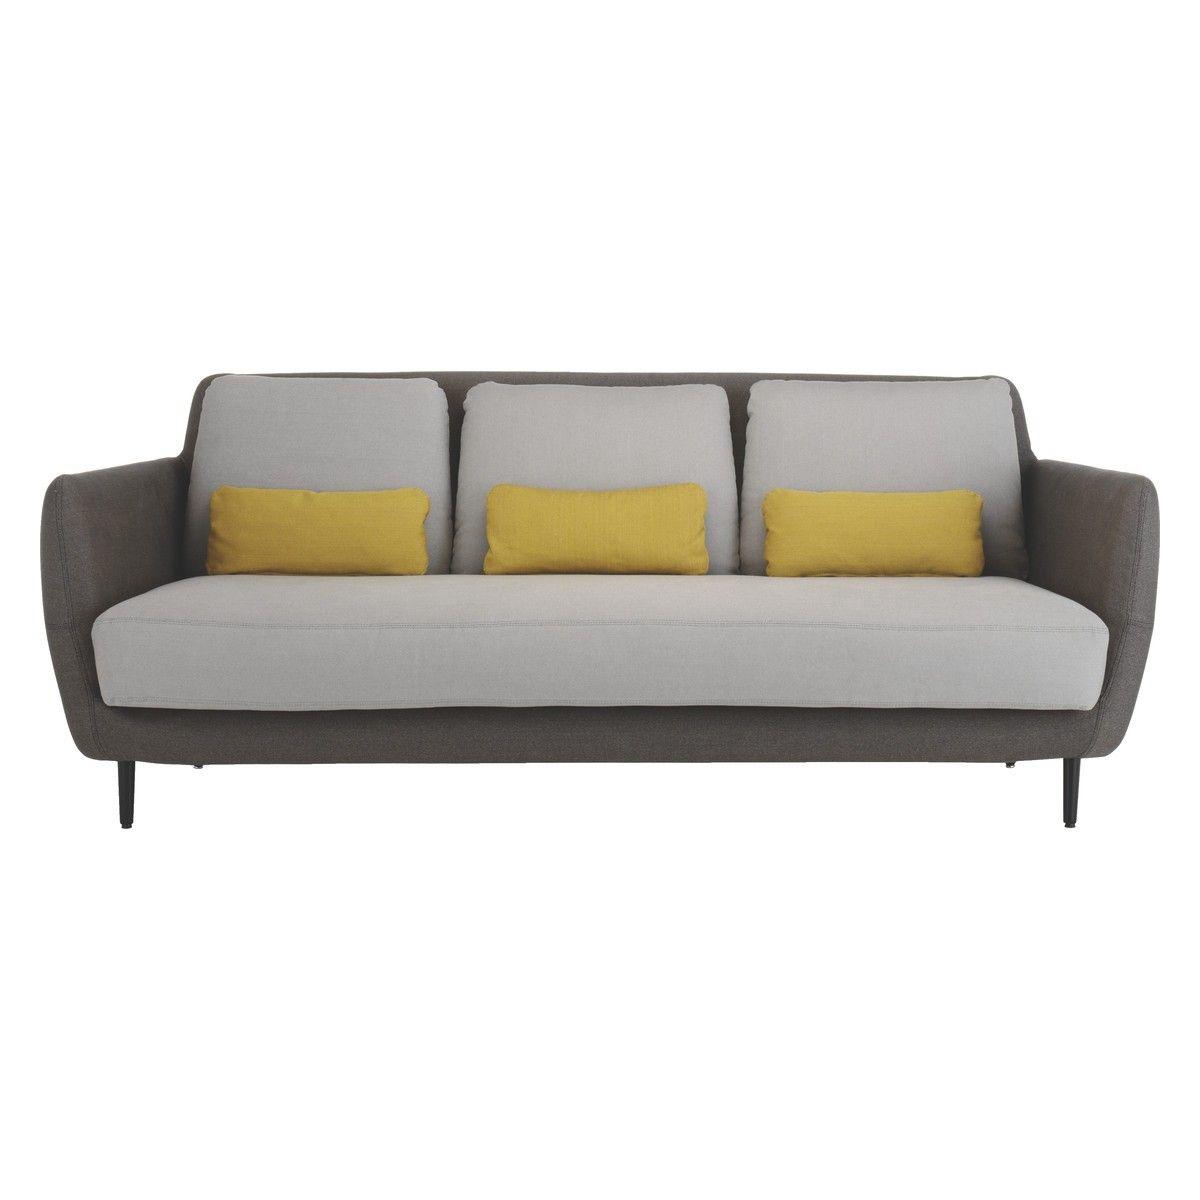 Ella Fabric 3 Seater Sofa Buy Now At Habitat Uk Sofas  # Muebles Badiola